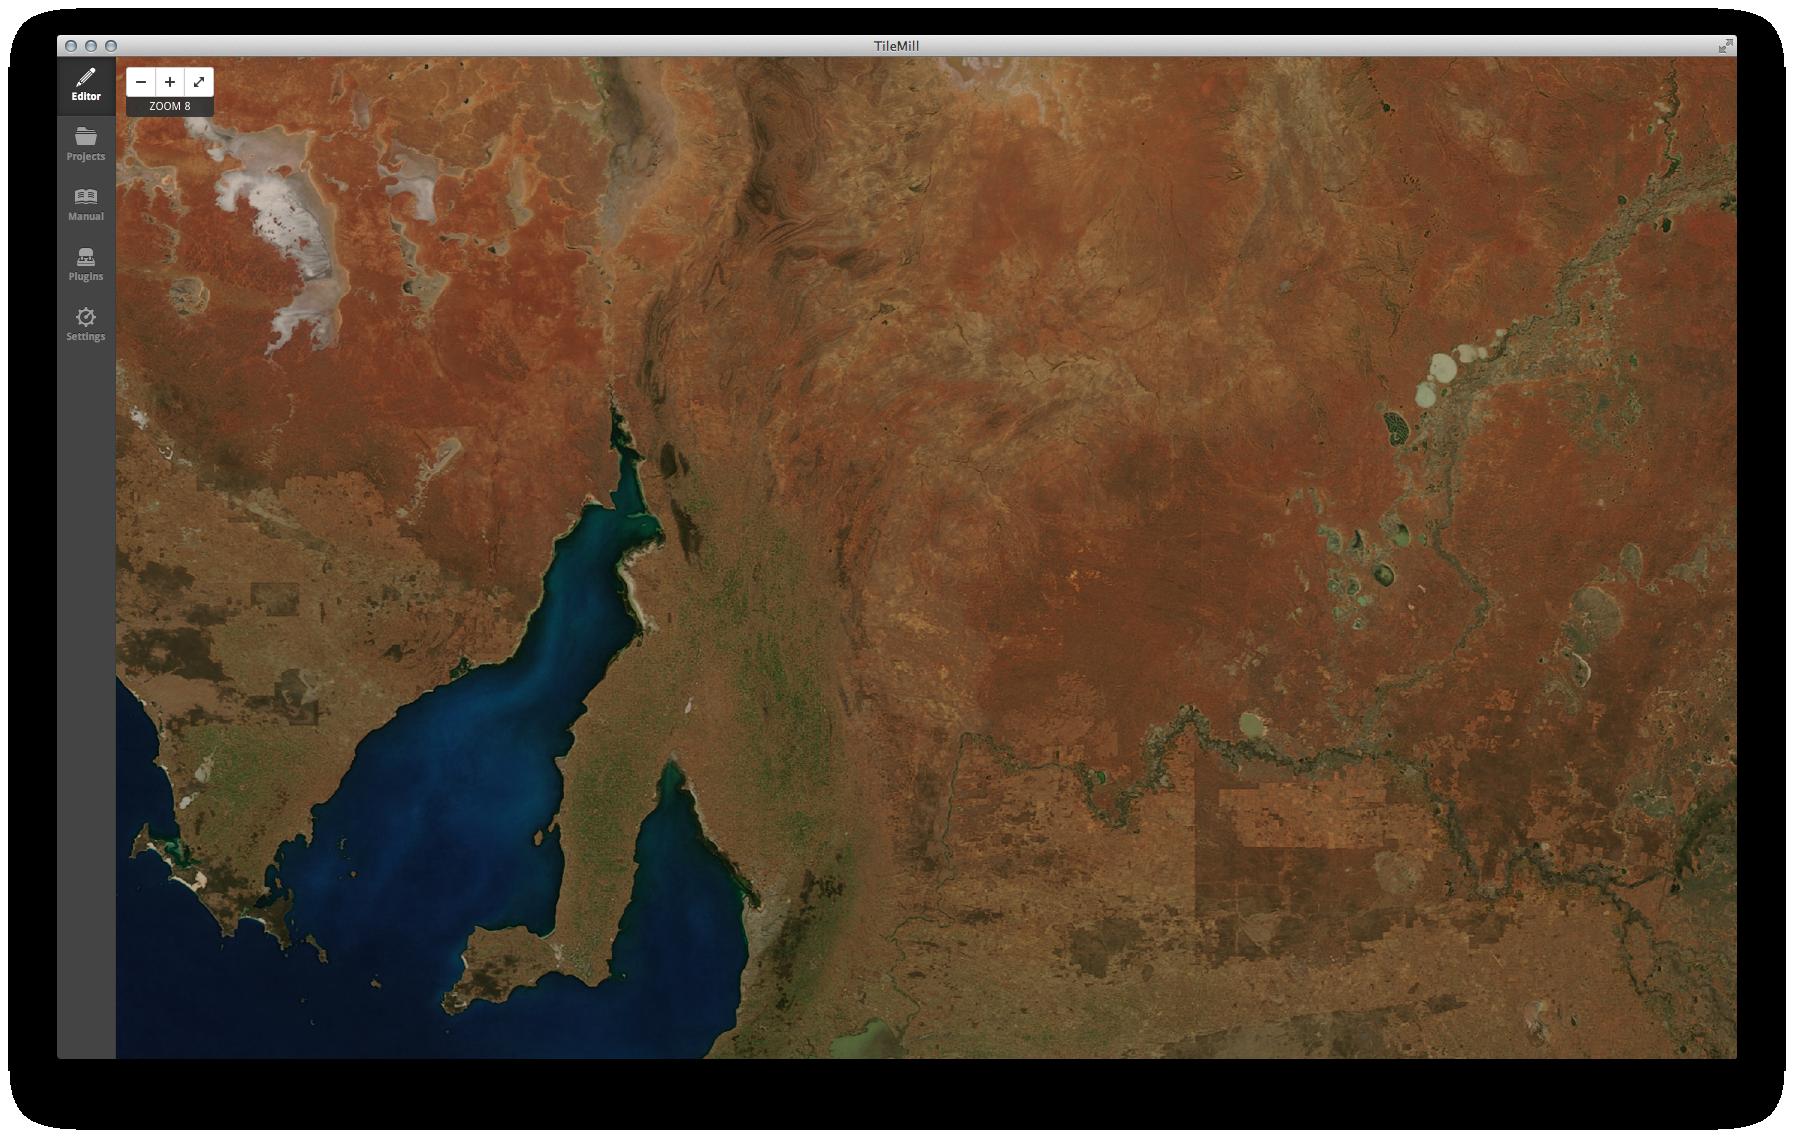 Adelaide, Australia (latitude −34.9, longitude 138.6)